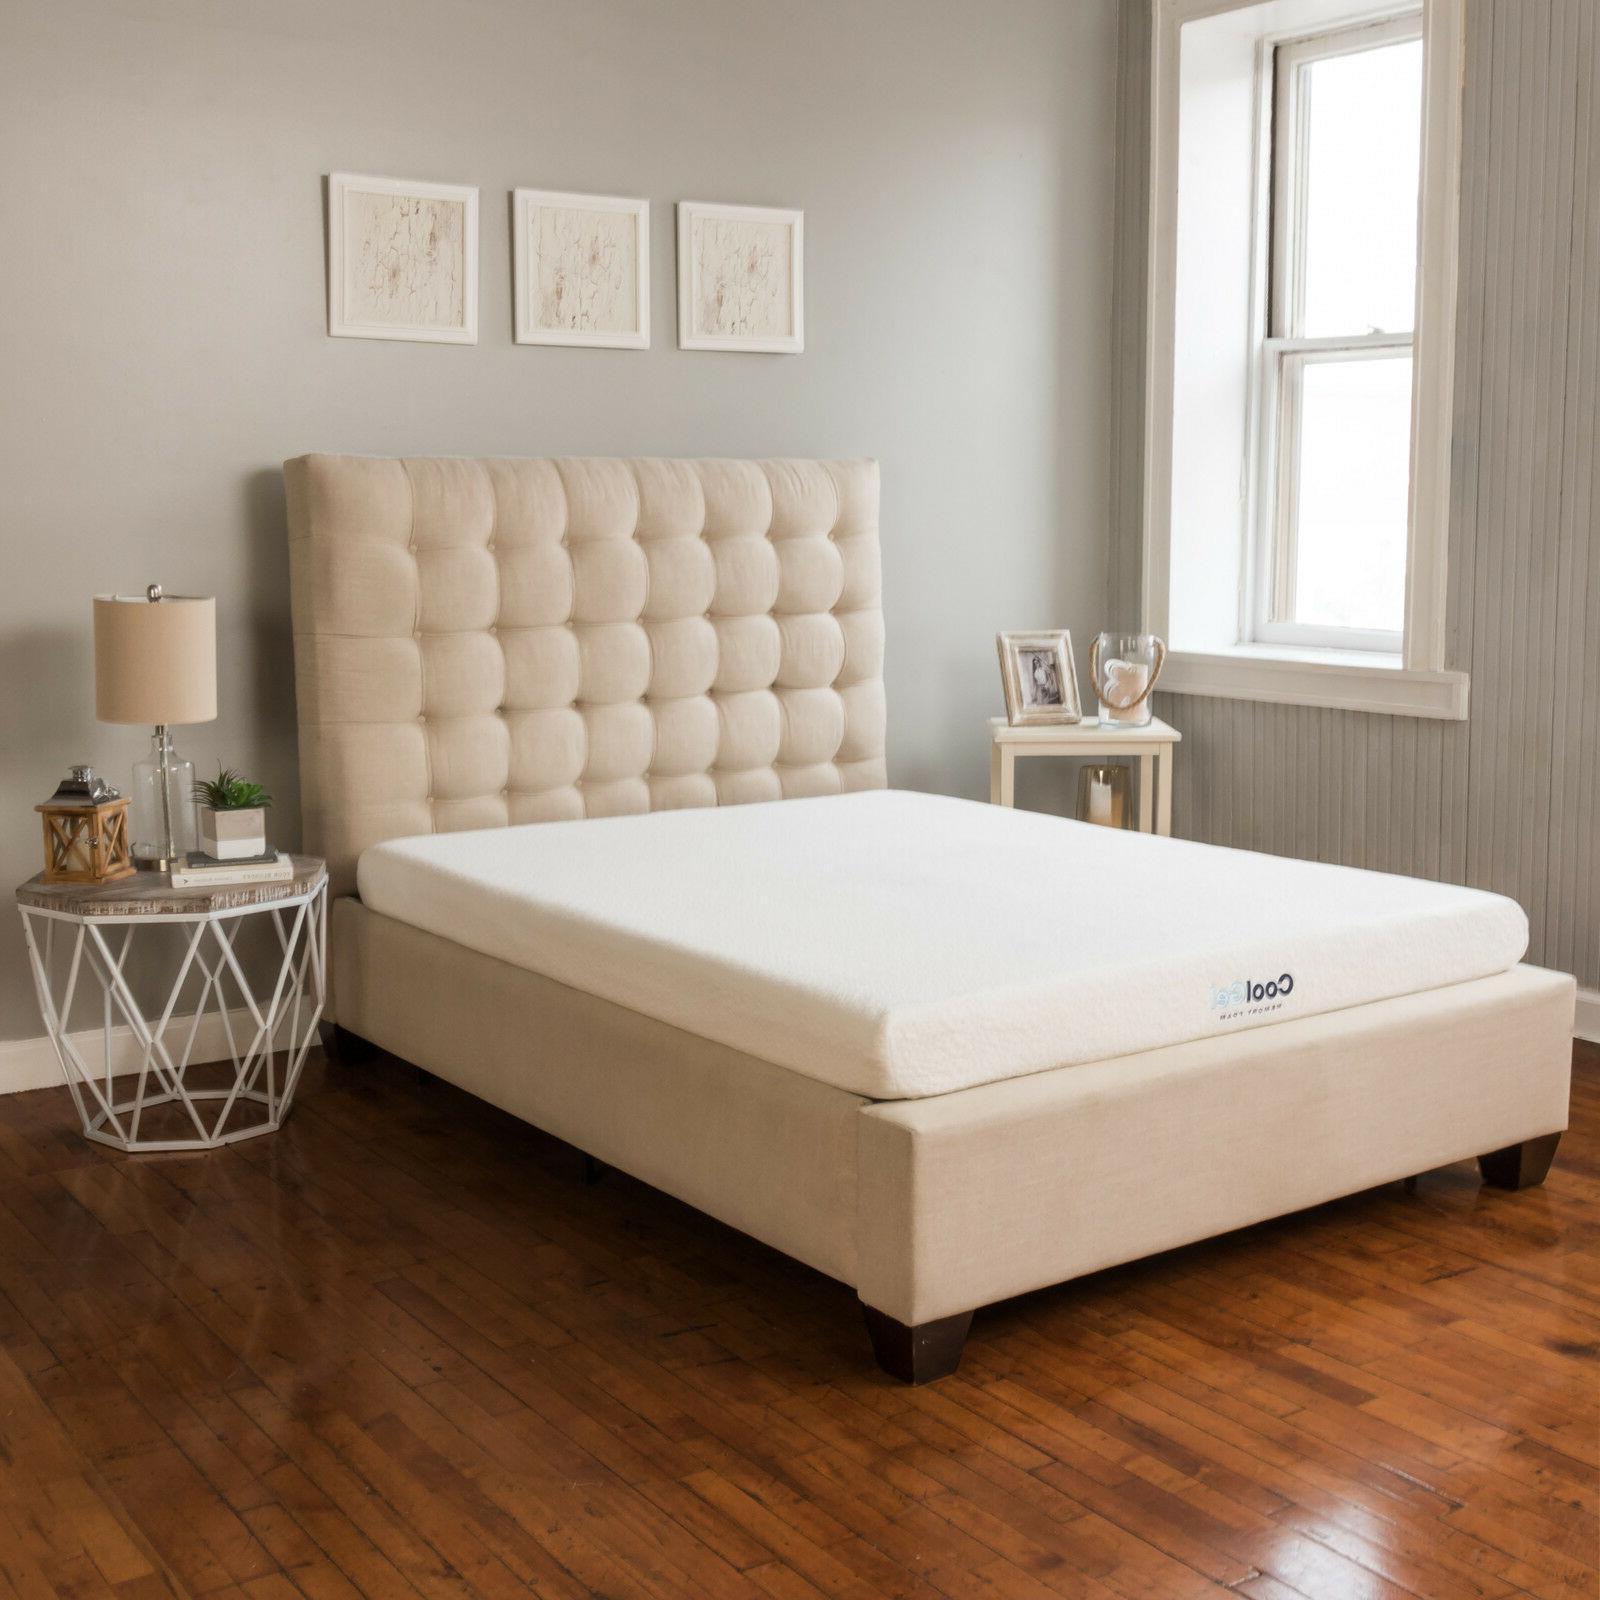 Cool Gel Memory Foam 6 Inch Mattress Bedframe Topper Bed Top